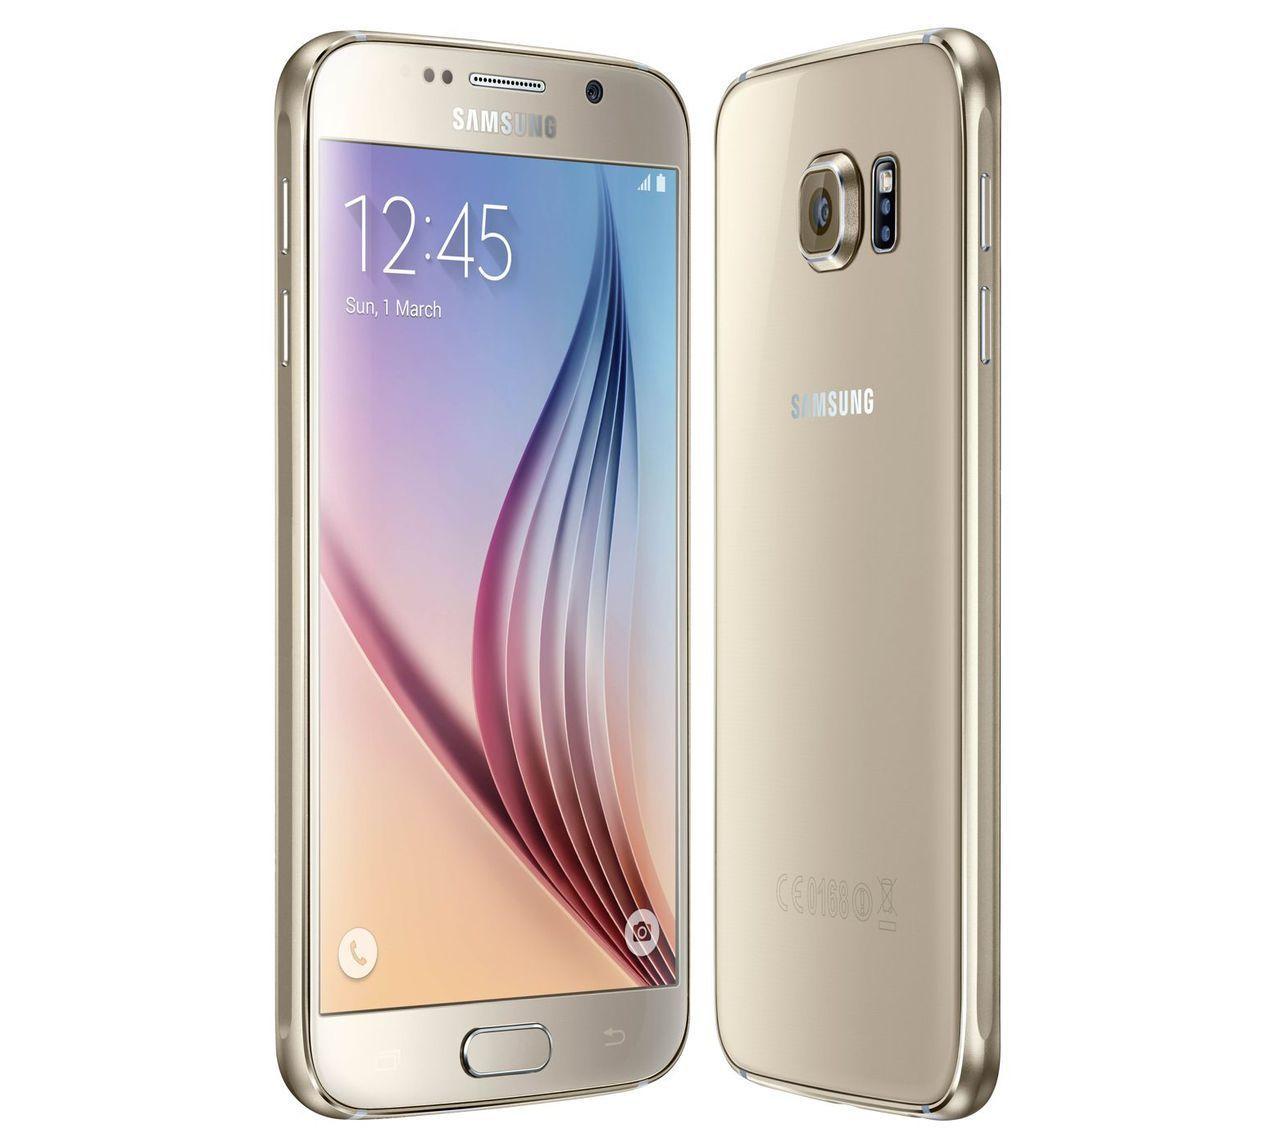 New Unlocked Samsung S6 32gb G920f Gold Quad Core 16mp Camera Smartphone Samsung Galaxy S6 Phone Smartphone